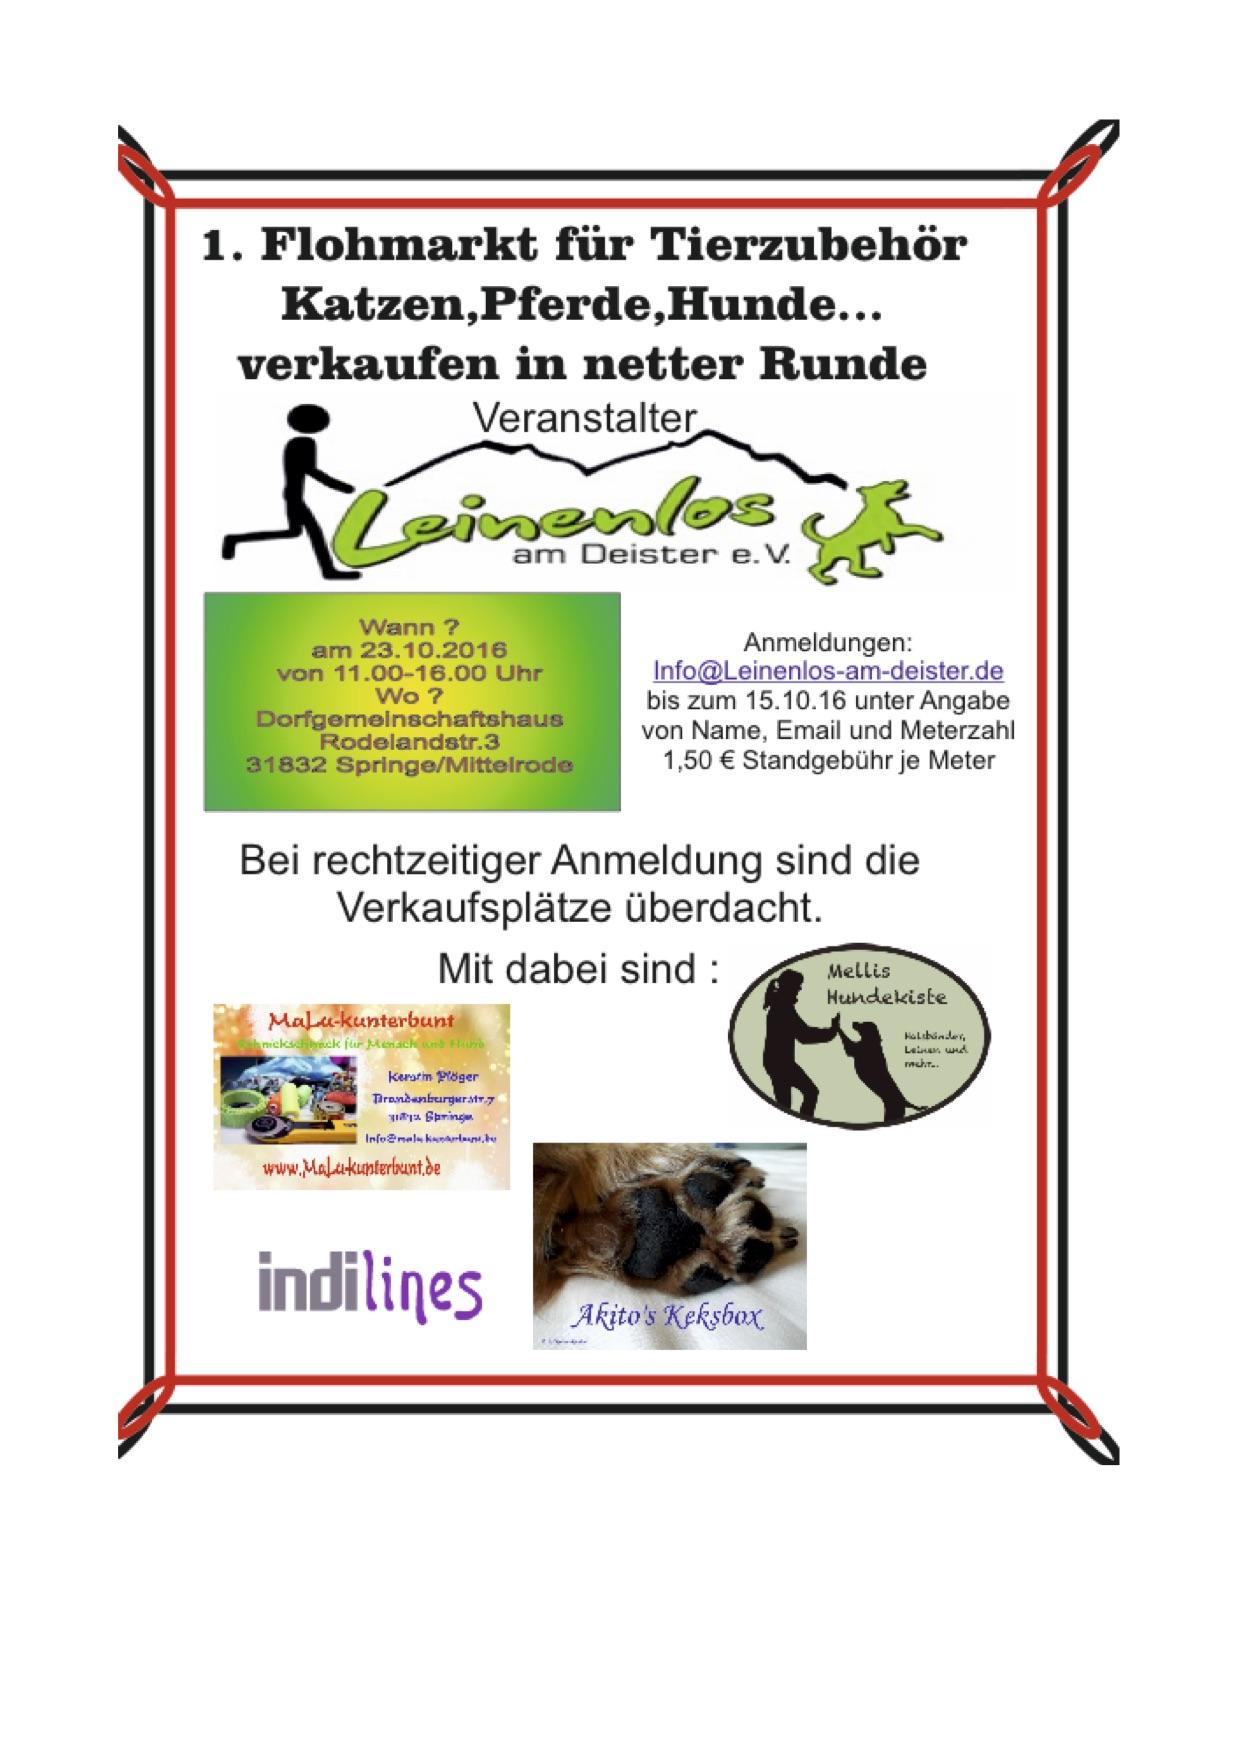 flohmarkt-flyer-jpg